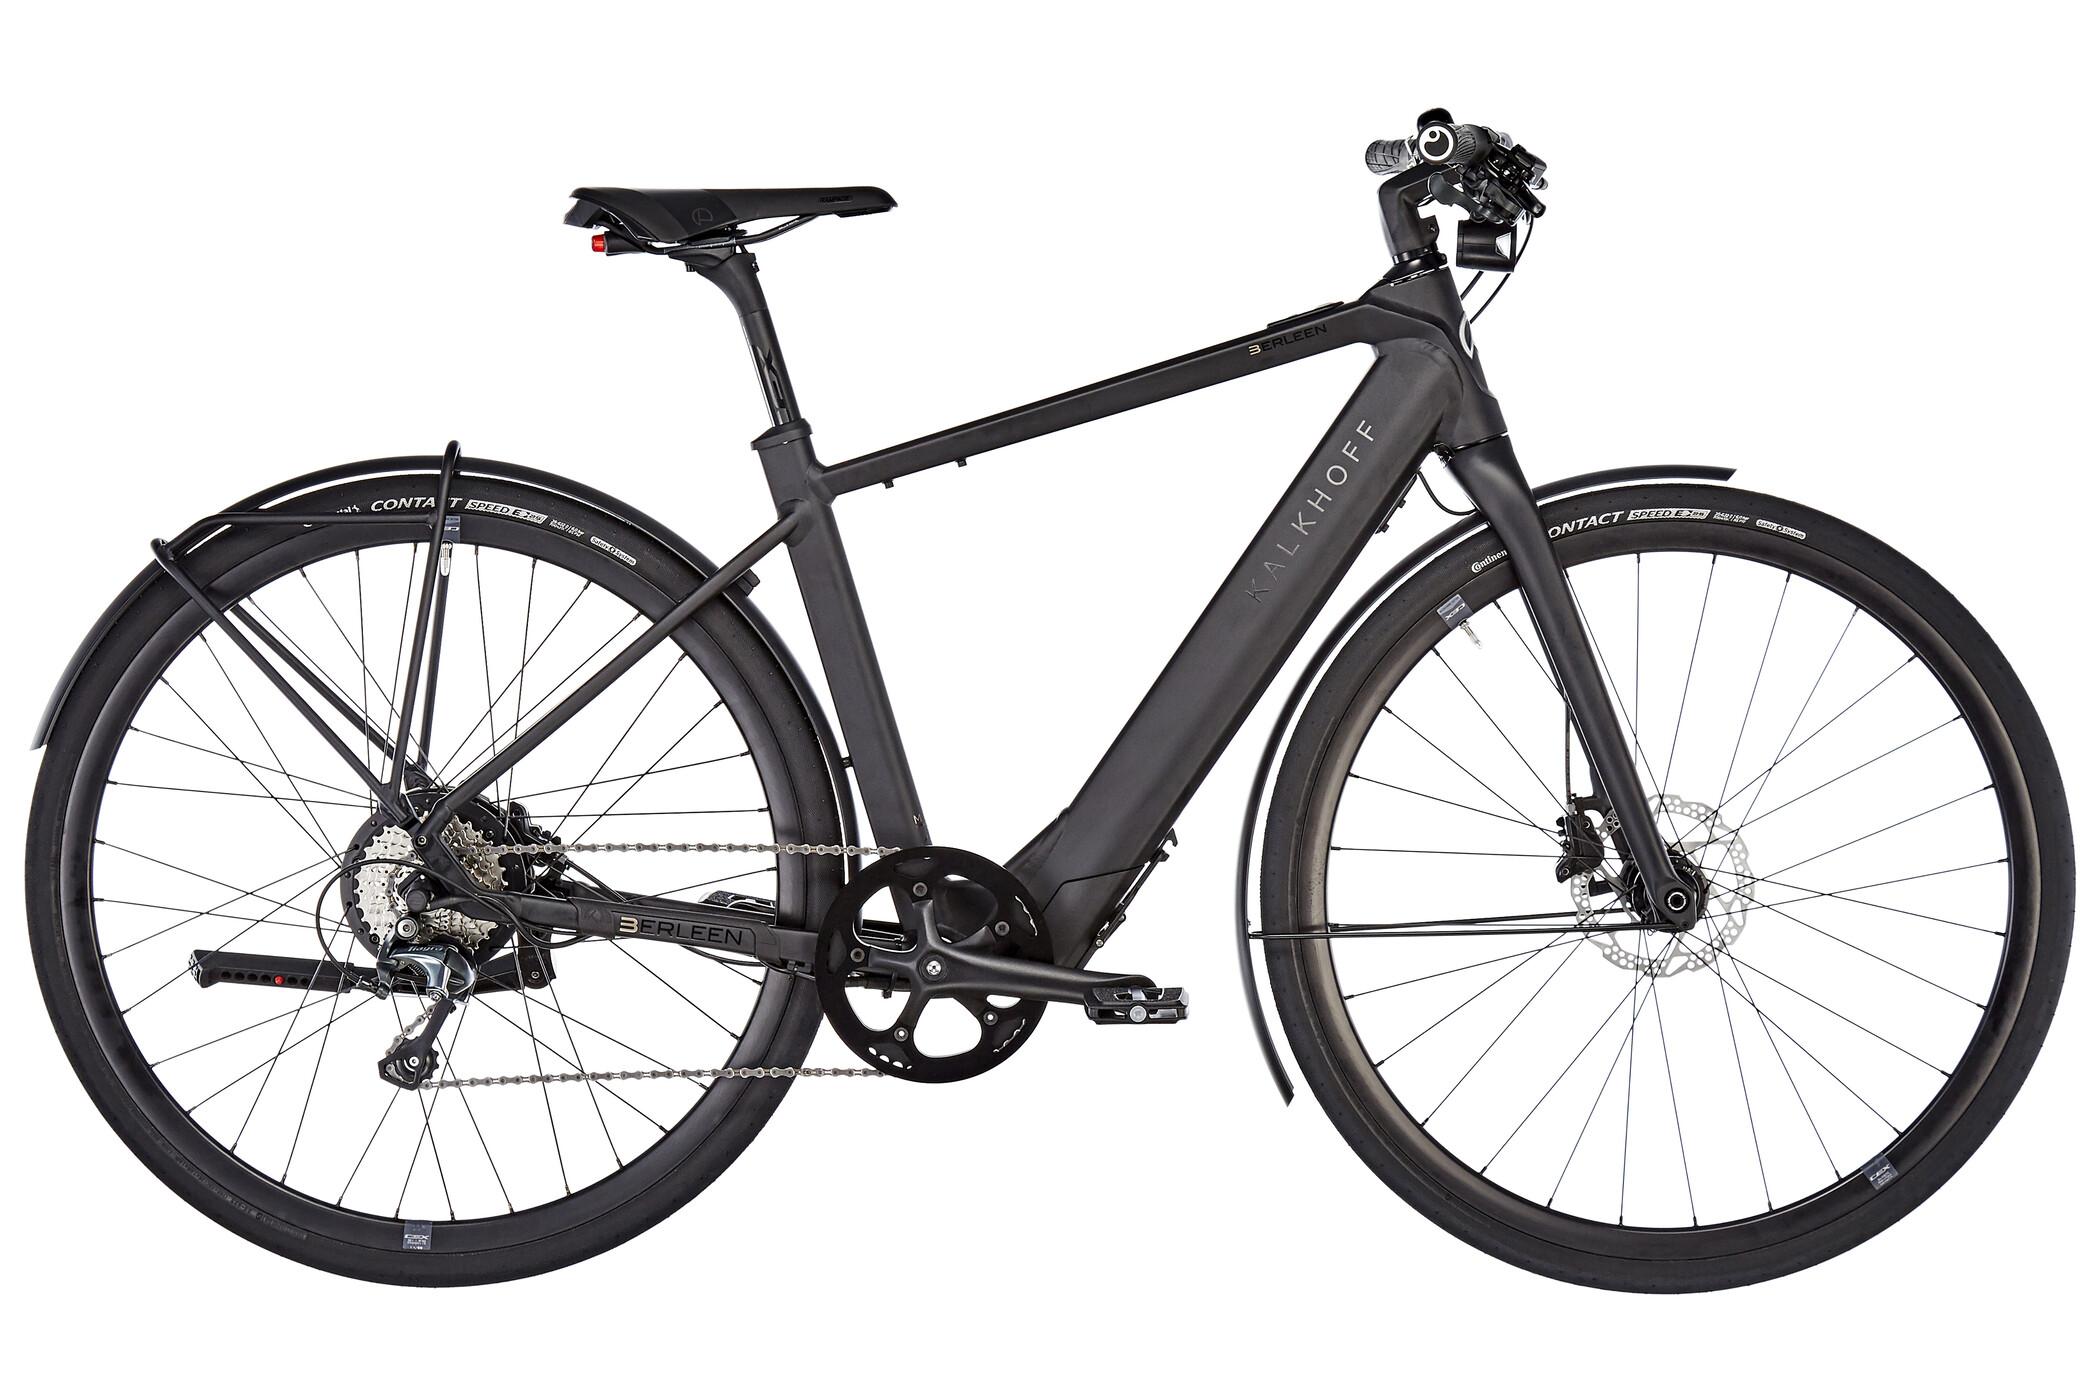 "Kalkhoff Berleen Advance G10 E-citybike 28"" 252Wh sort (2019) | City-cykler"